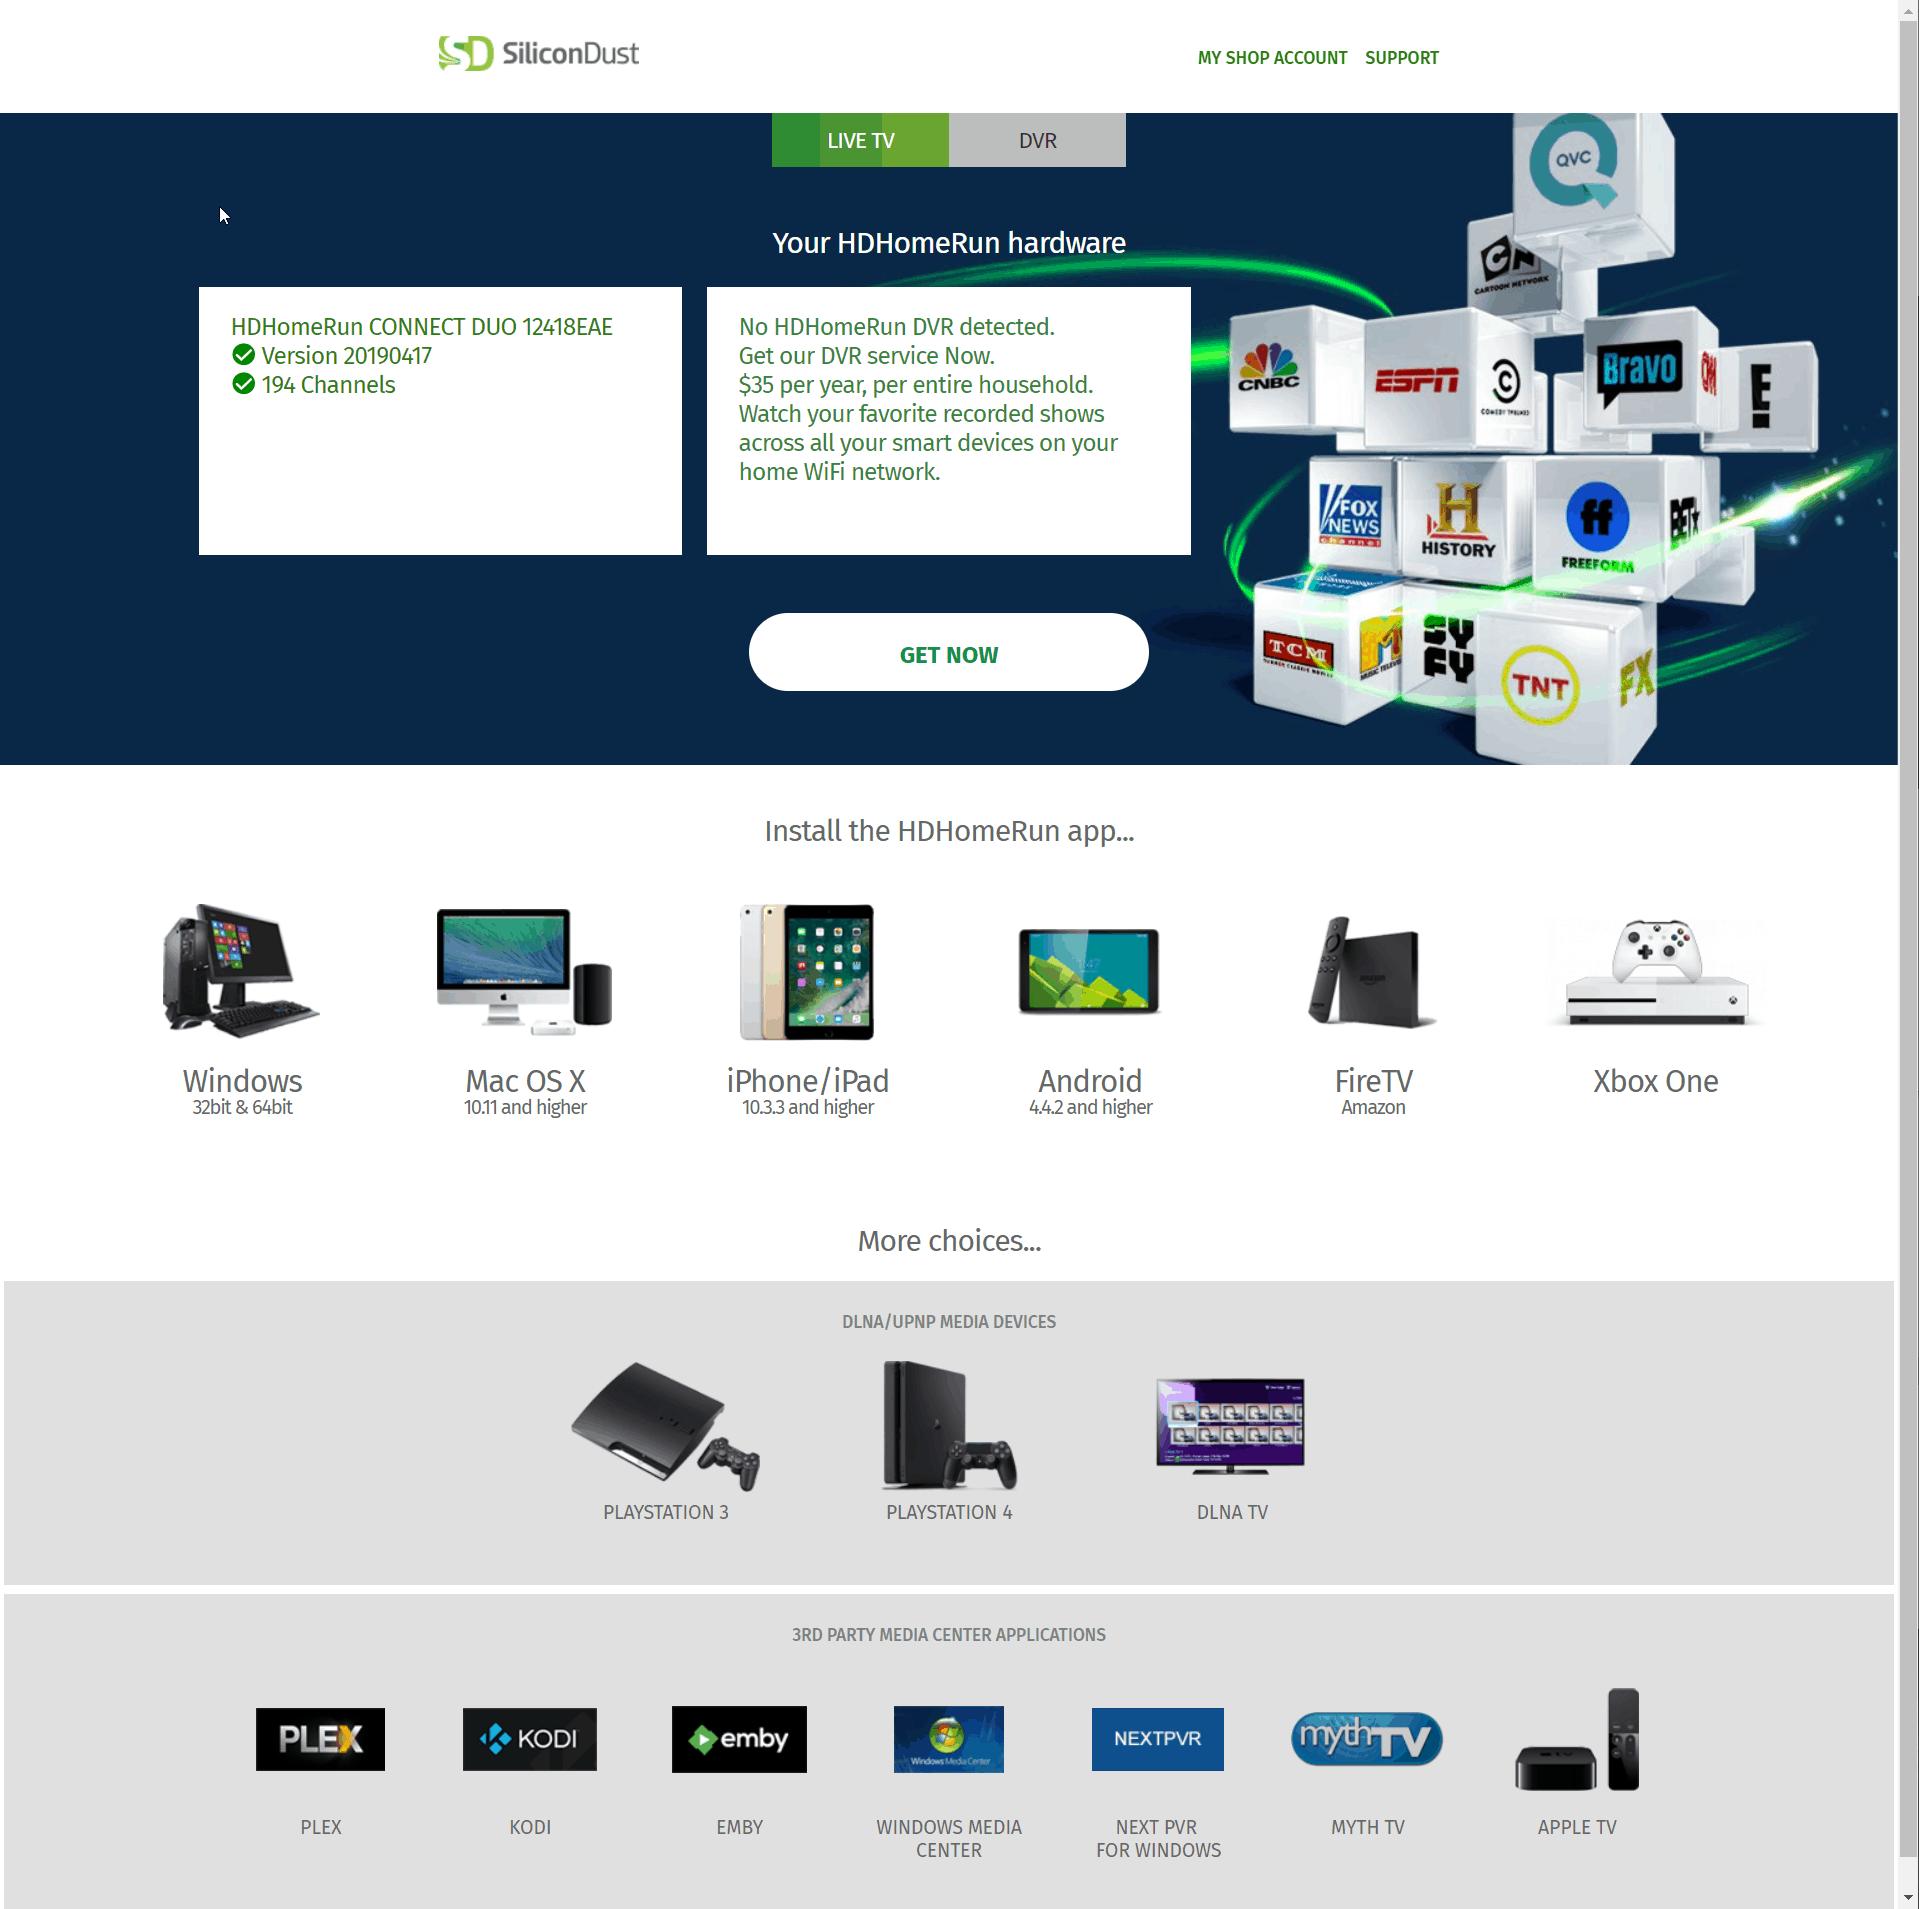 Nvidia Shield with Plex Server and live TV via HDHomeRun Guide